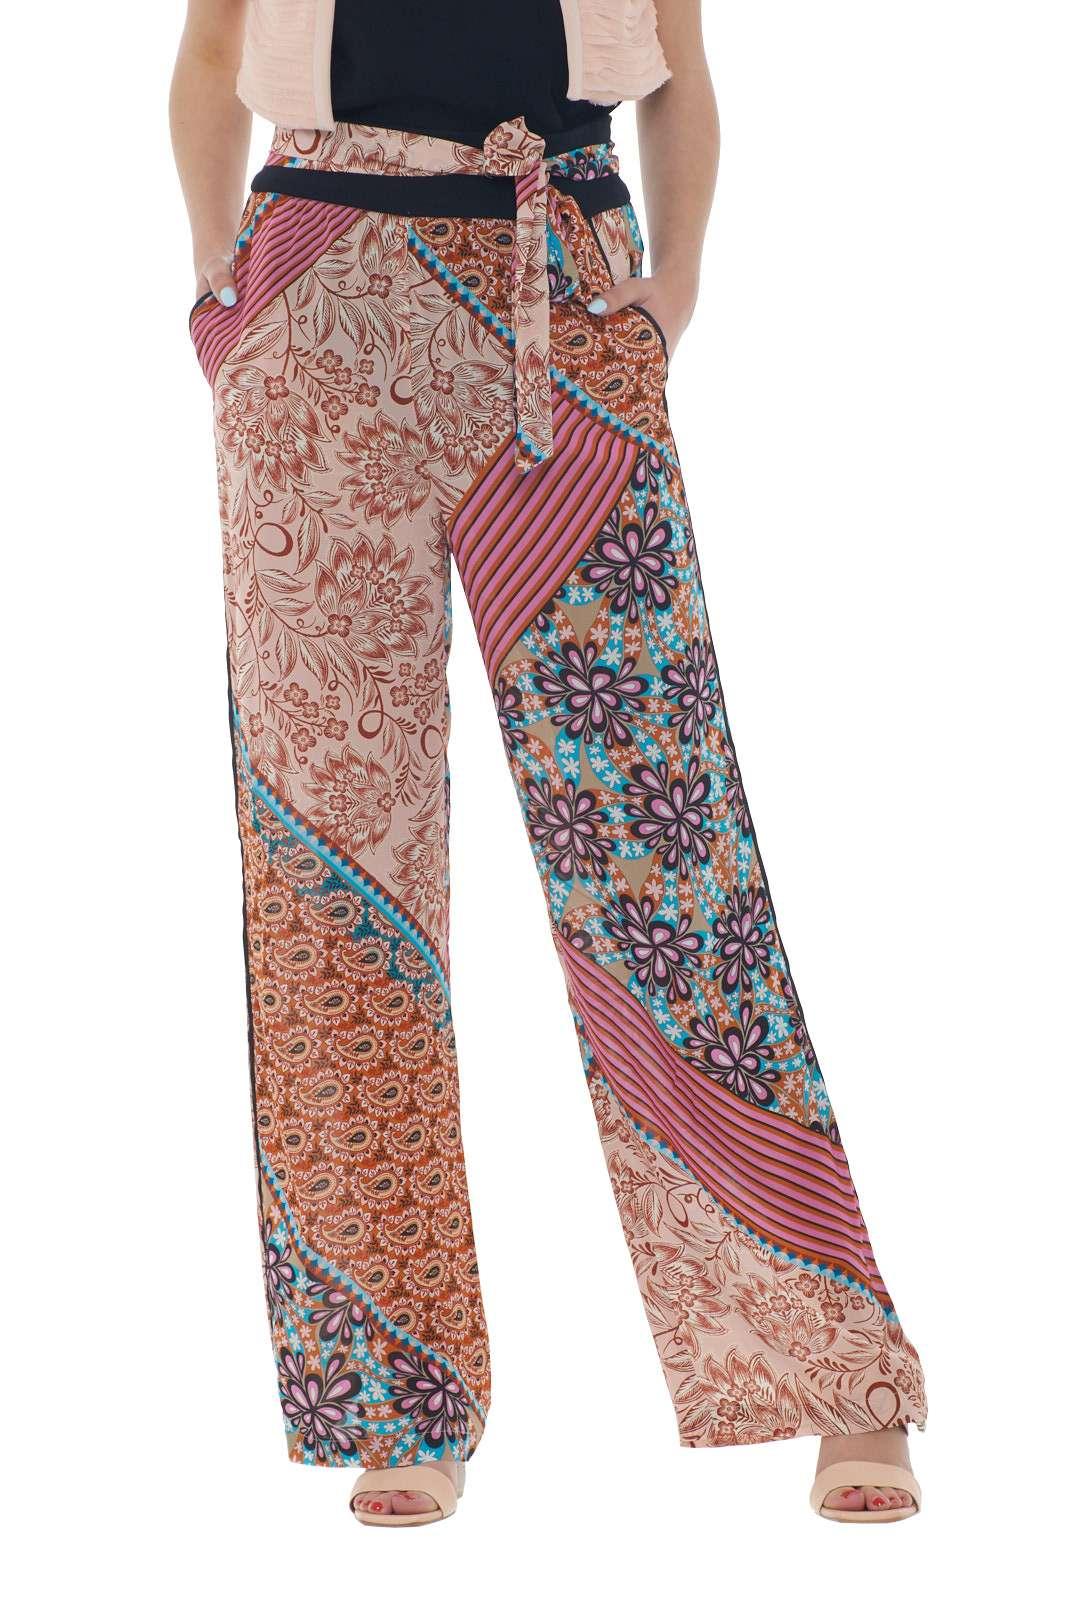 https://www.parmax.com/media/catalog/product/a/i/PE-outlet_parmax-pantaloni-donna-Pinko-1g14uq-A.jpg